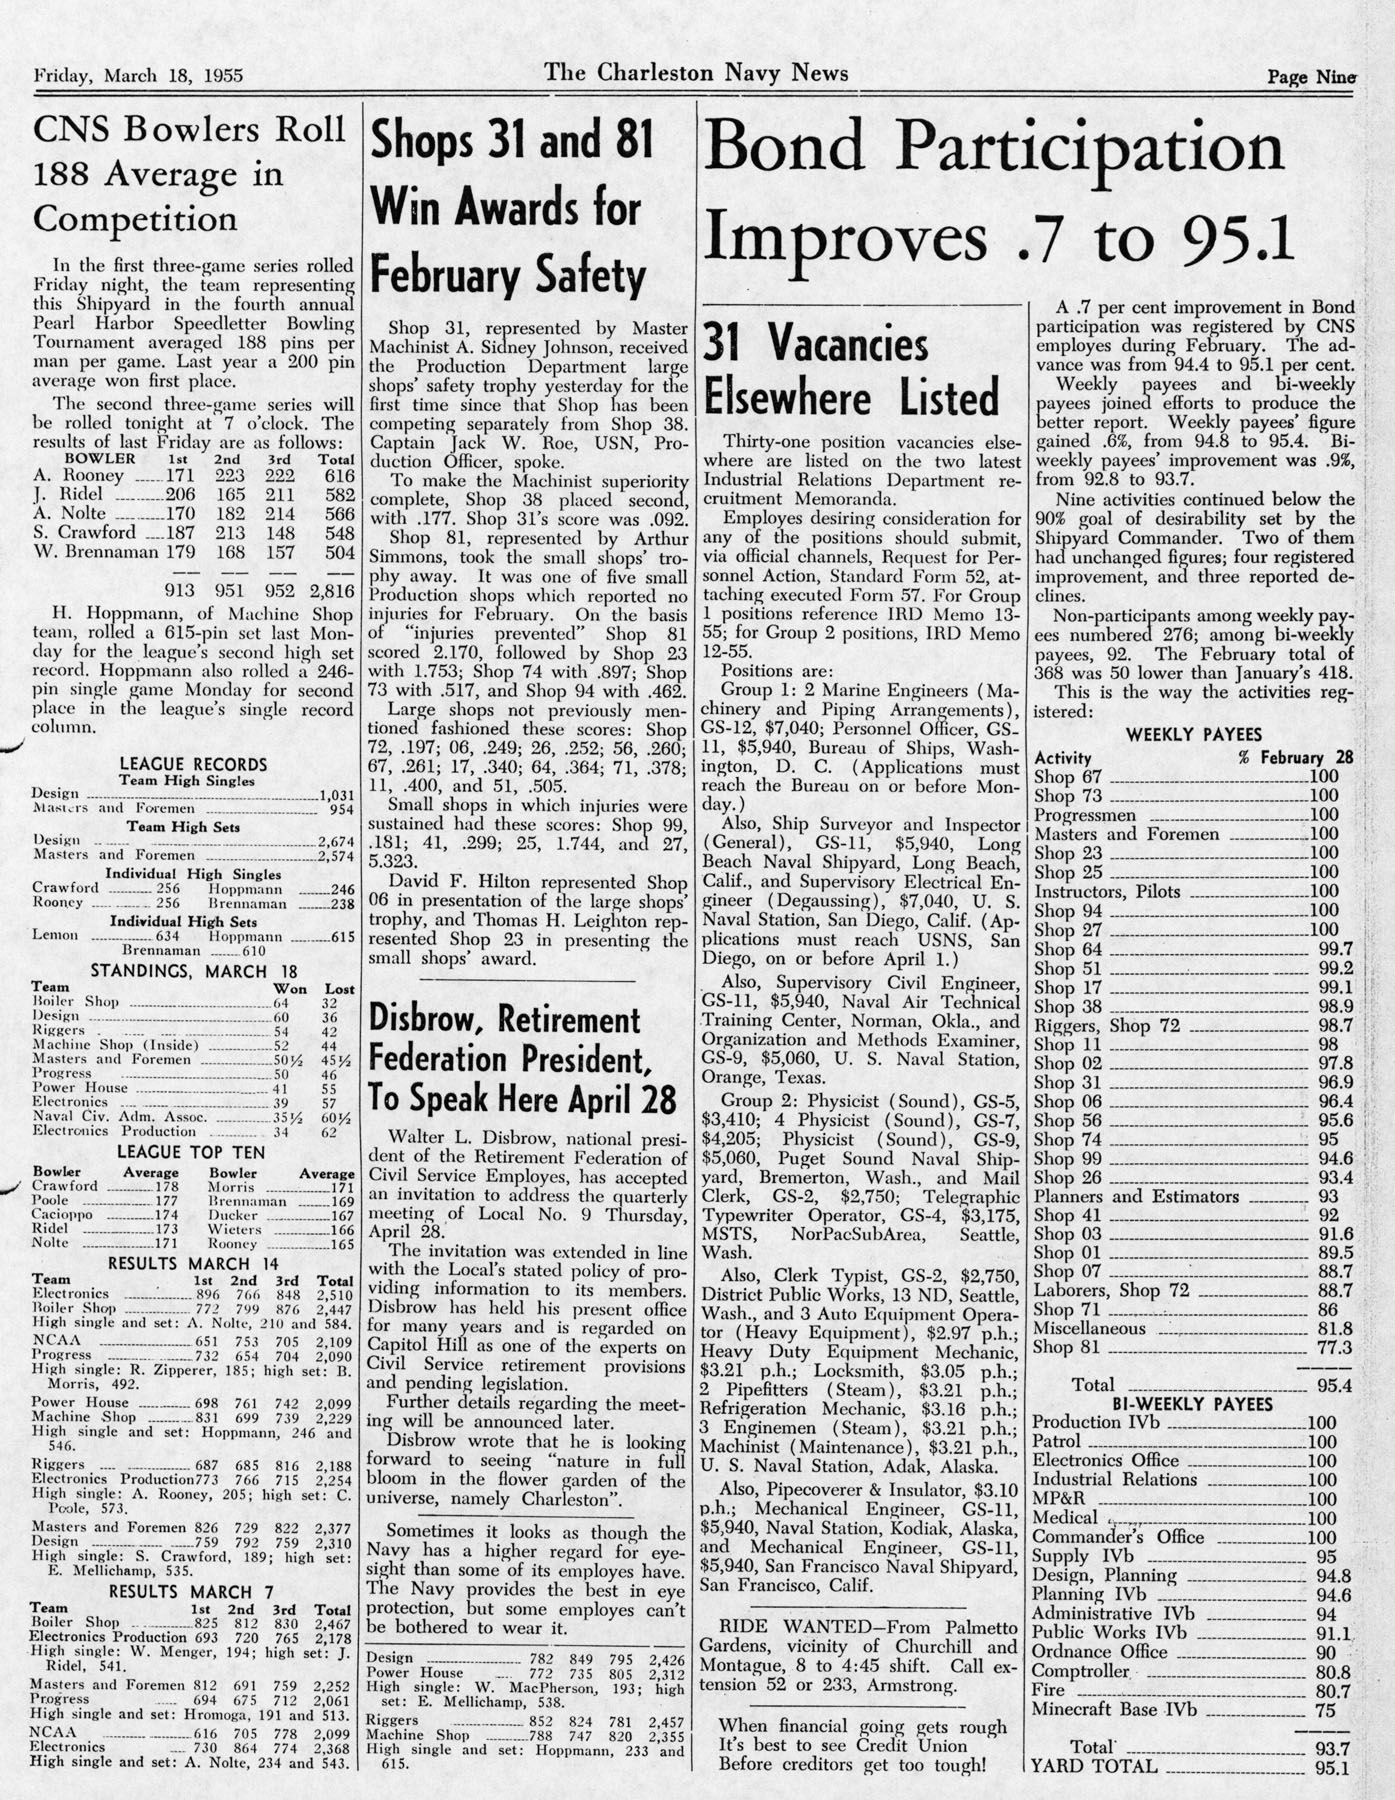 The Charleston Navy News, Volume 13, Edition 18, page ix